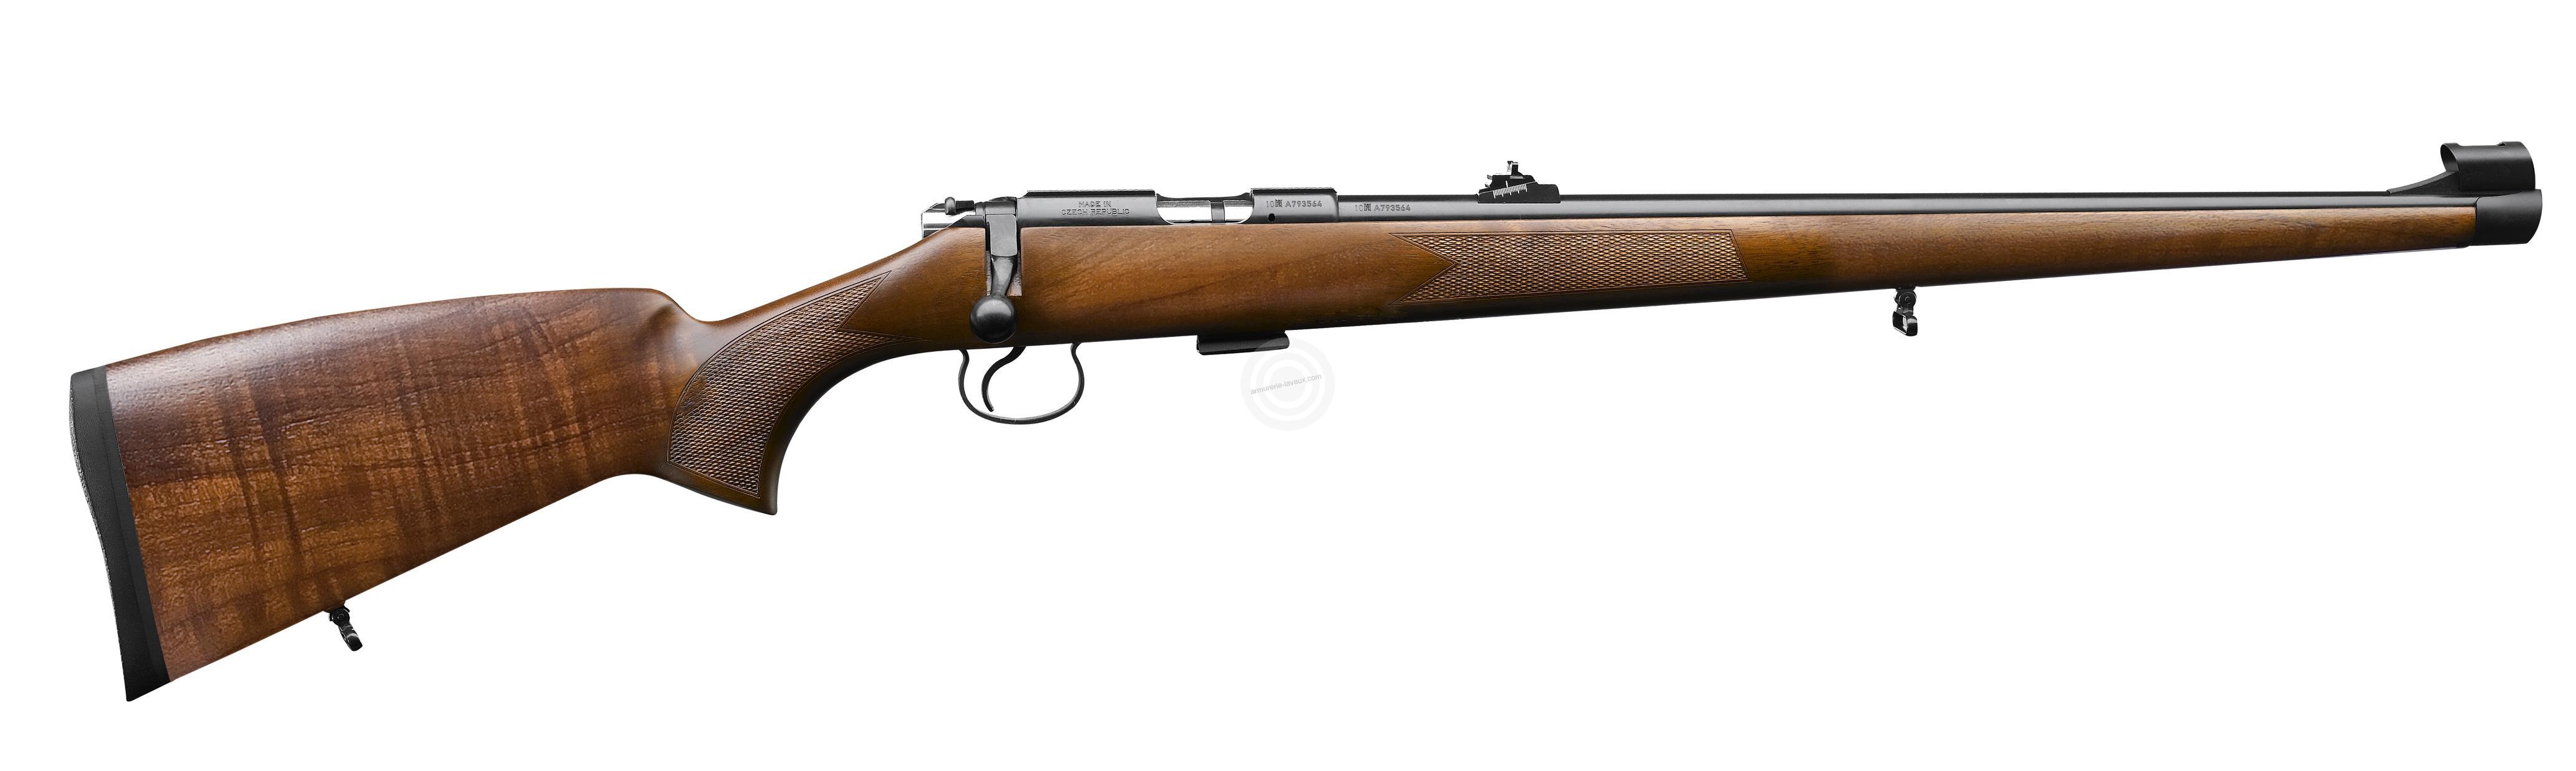 Carabine 22LR CZ 455 Fût Long